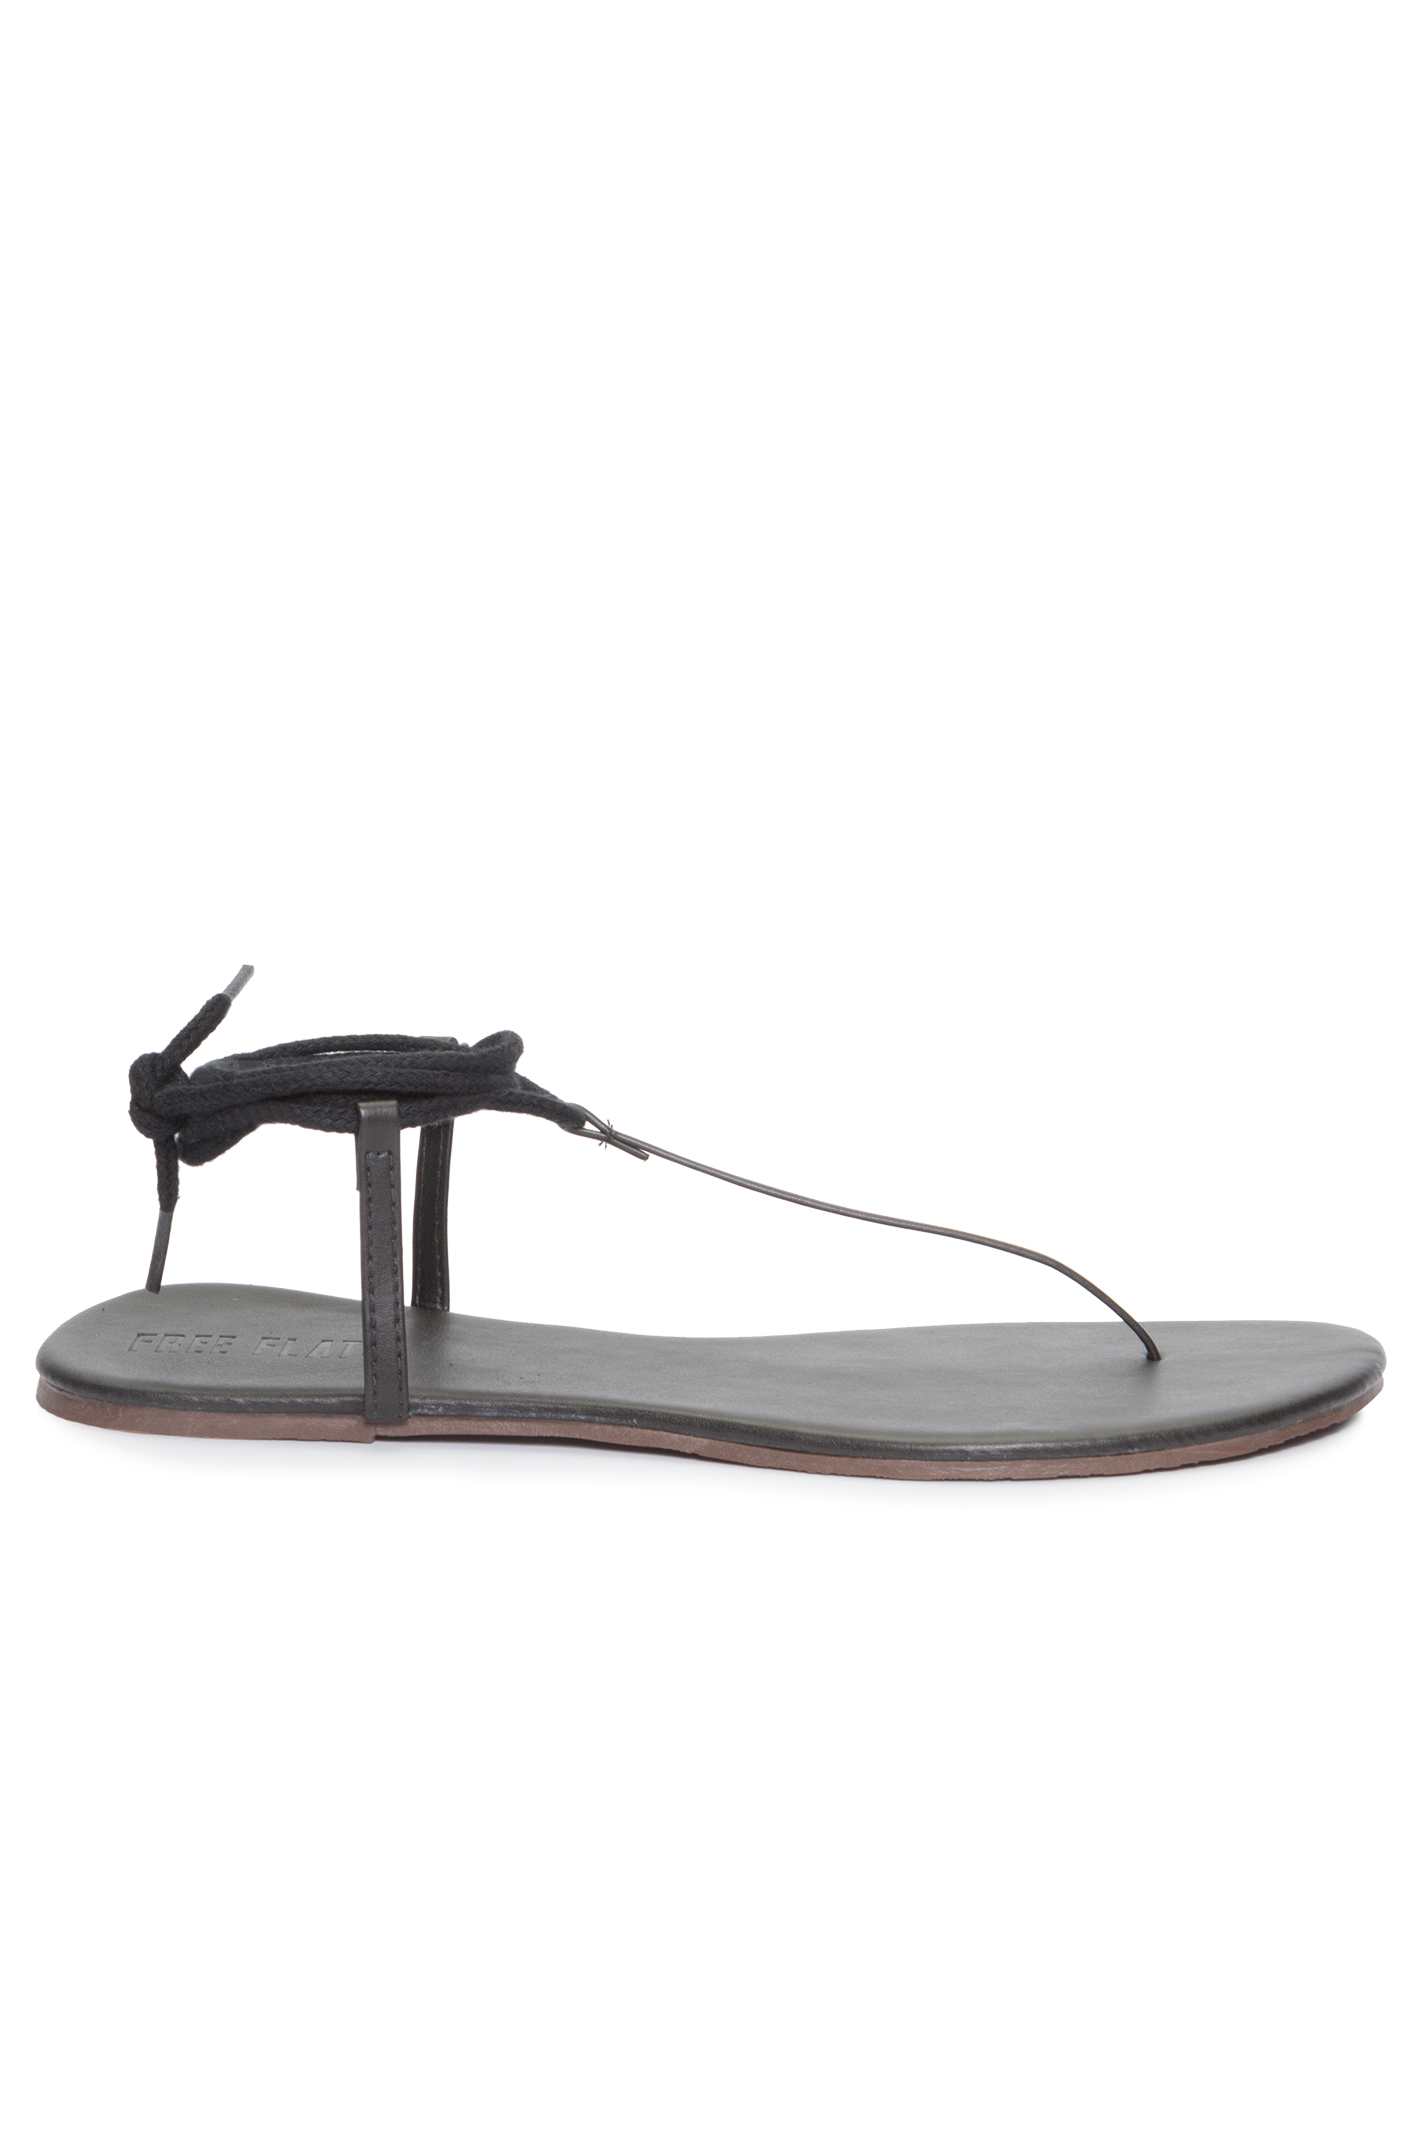 Sandália Rasteira T-Strap Lace Up Preta